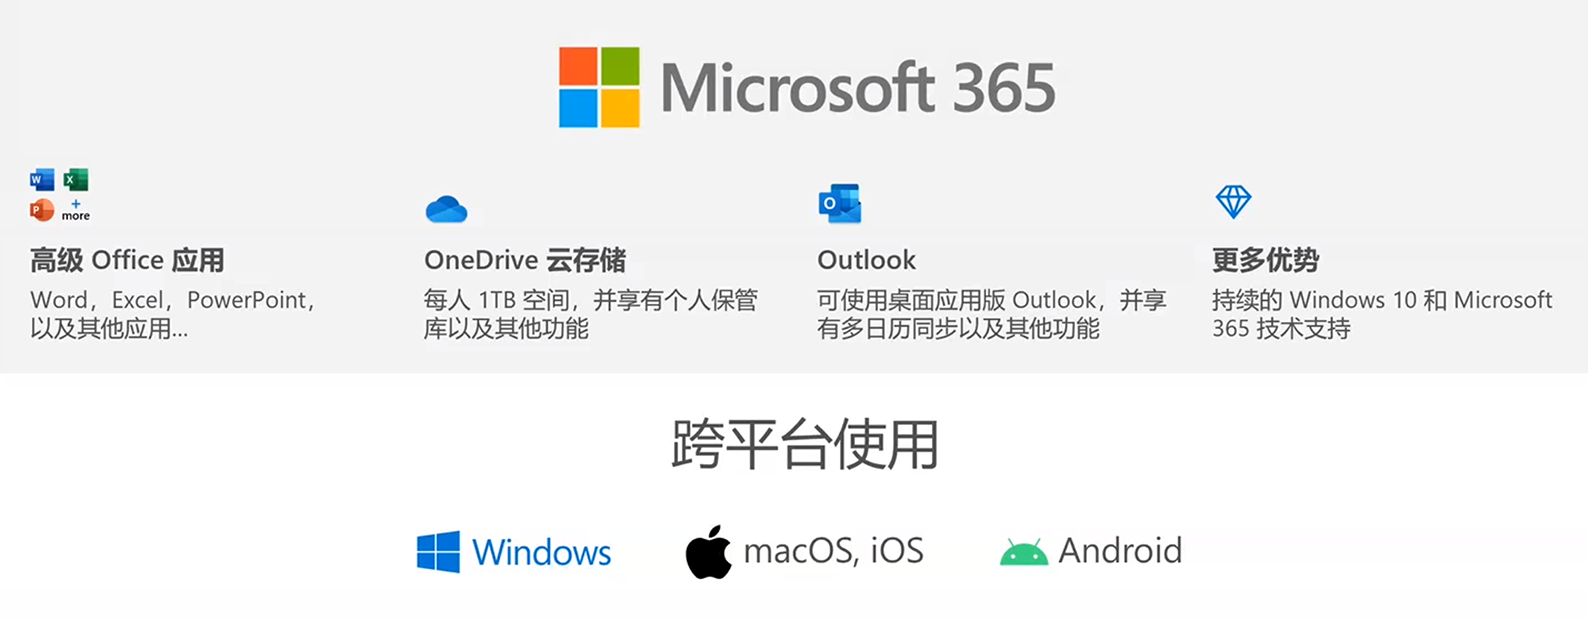 https://asset.droidyue.com/image/lizhi_io/office_365_21_03/image_1.png